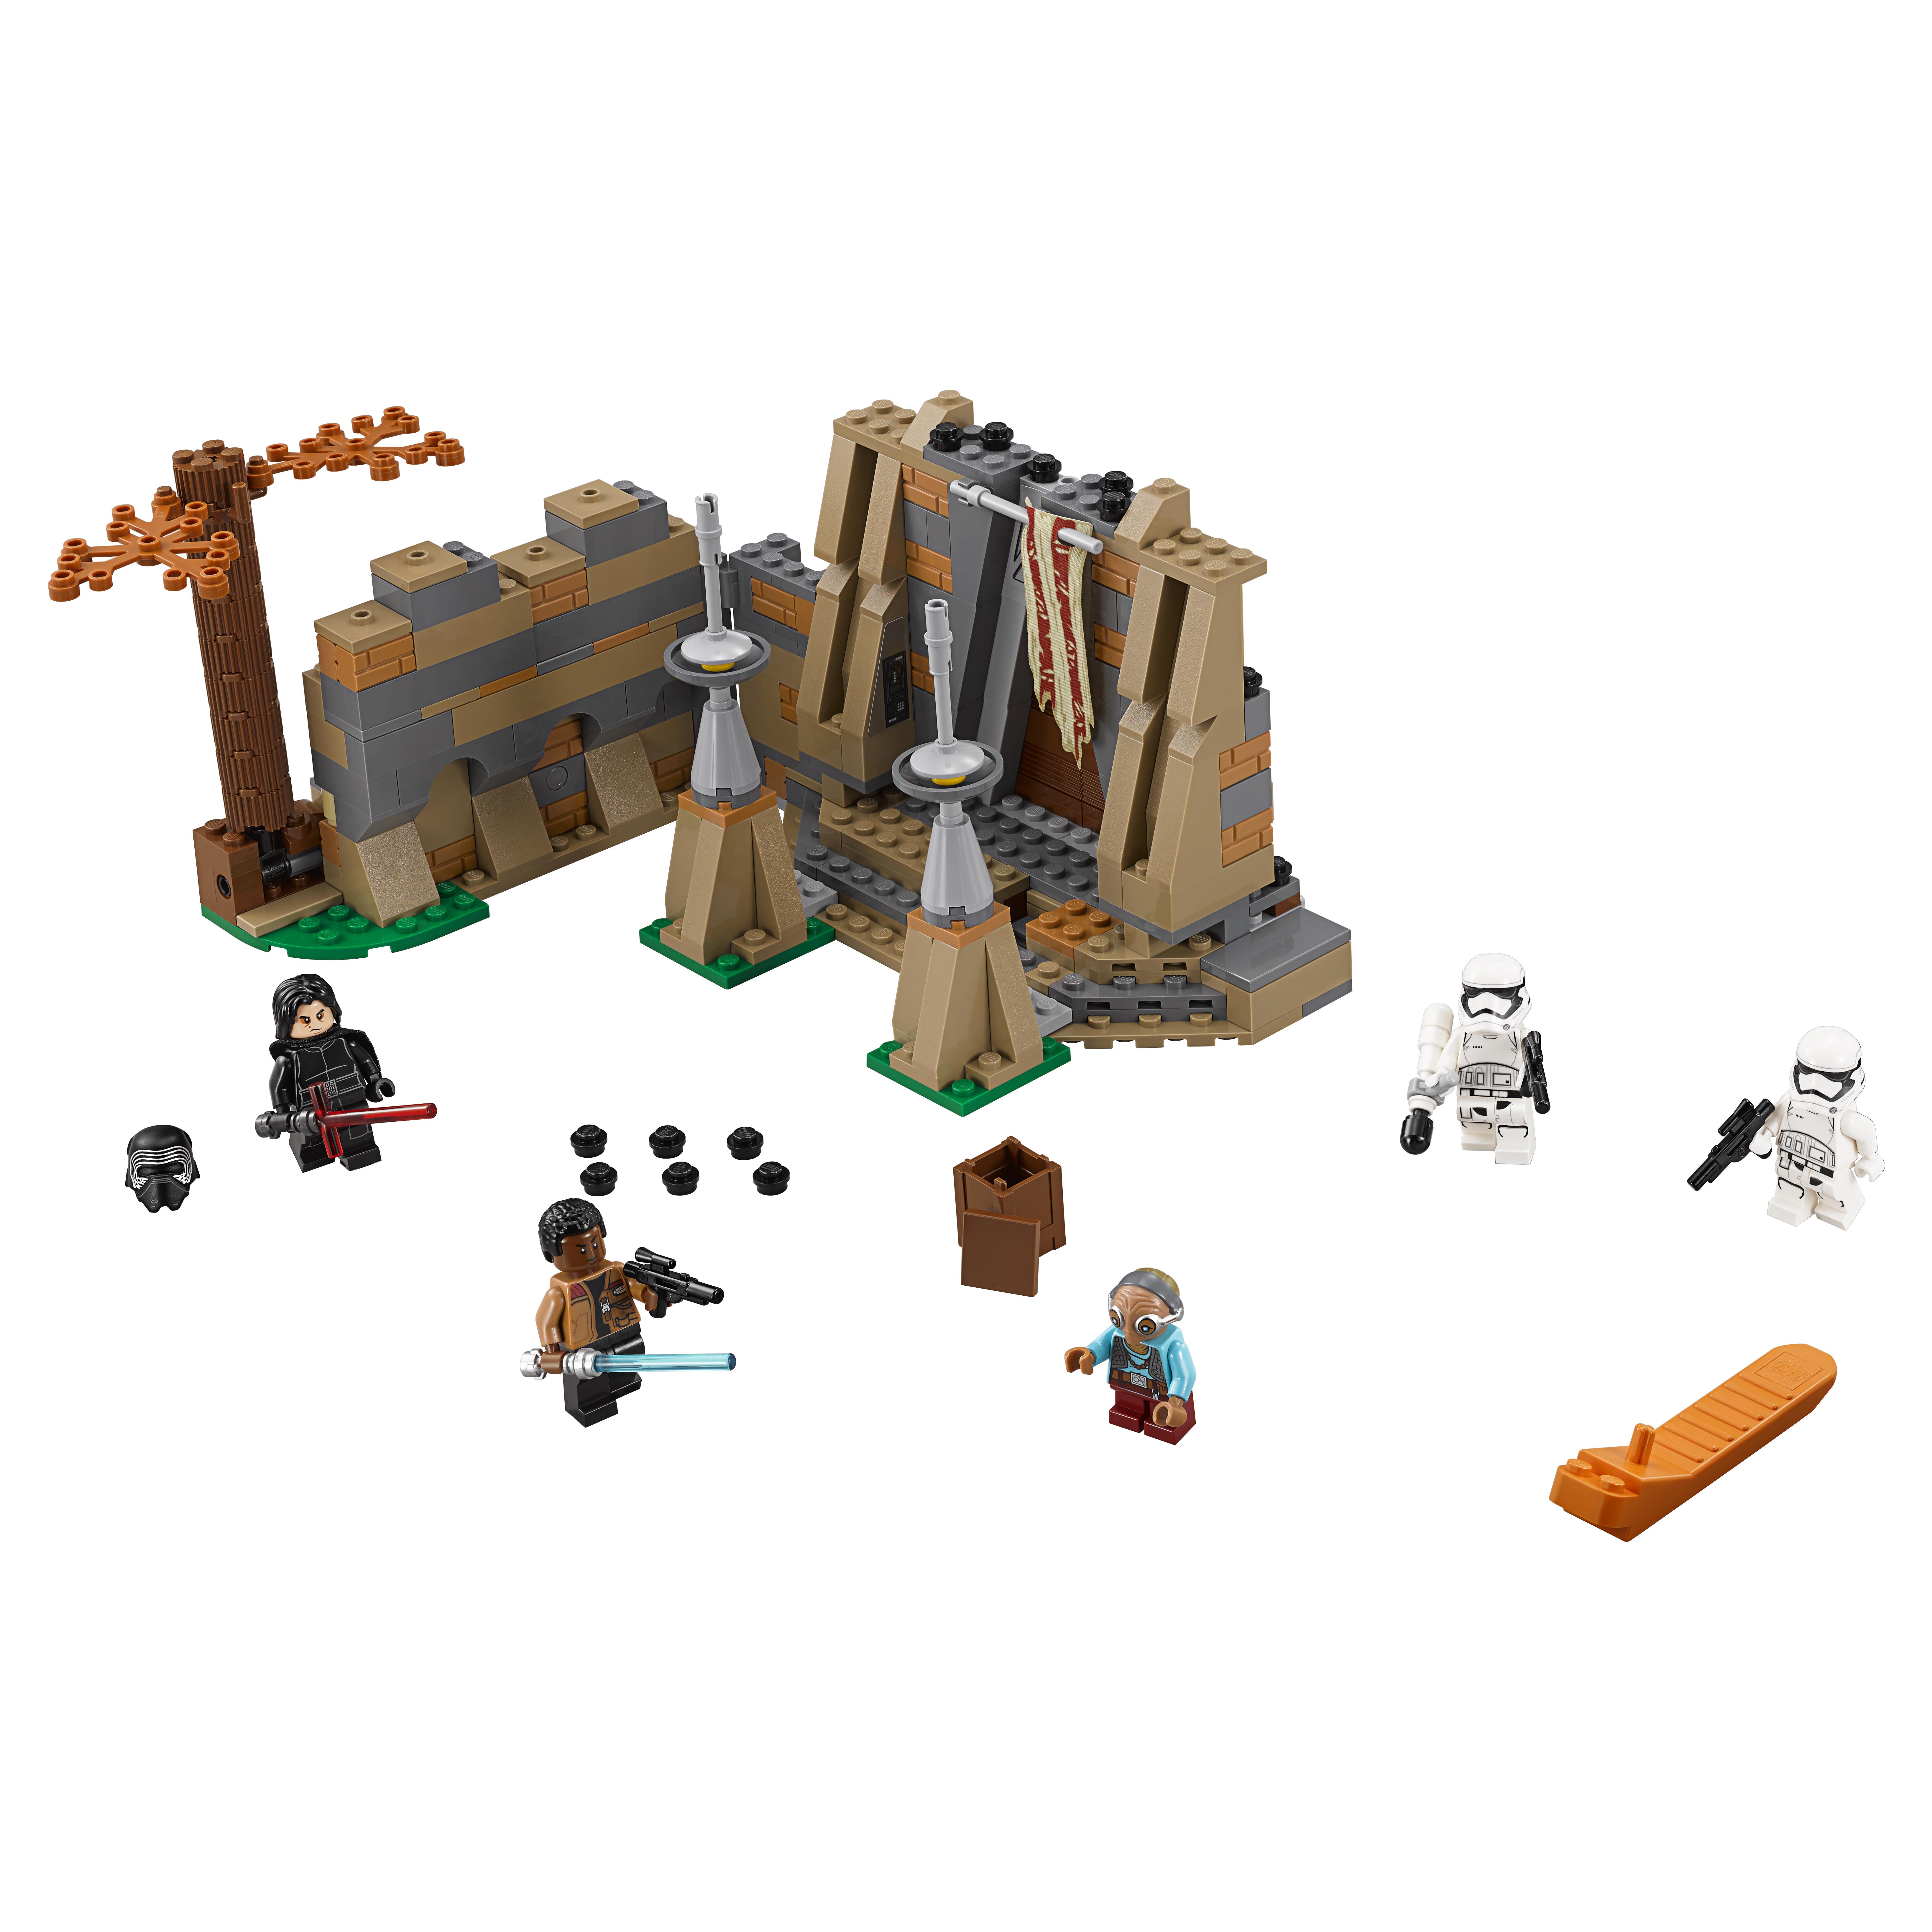 Конструктор LEGO Star Wars Битва планете Такодана (75139) конструктор lego star wars битва планете такодана 75139